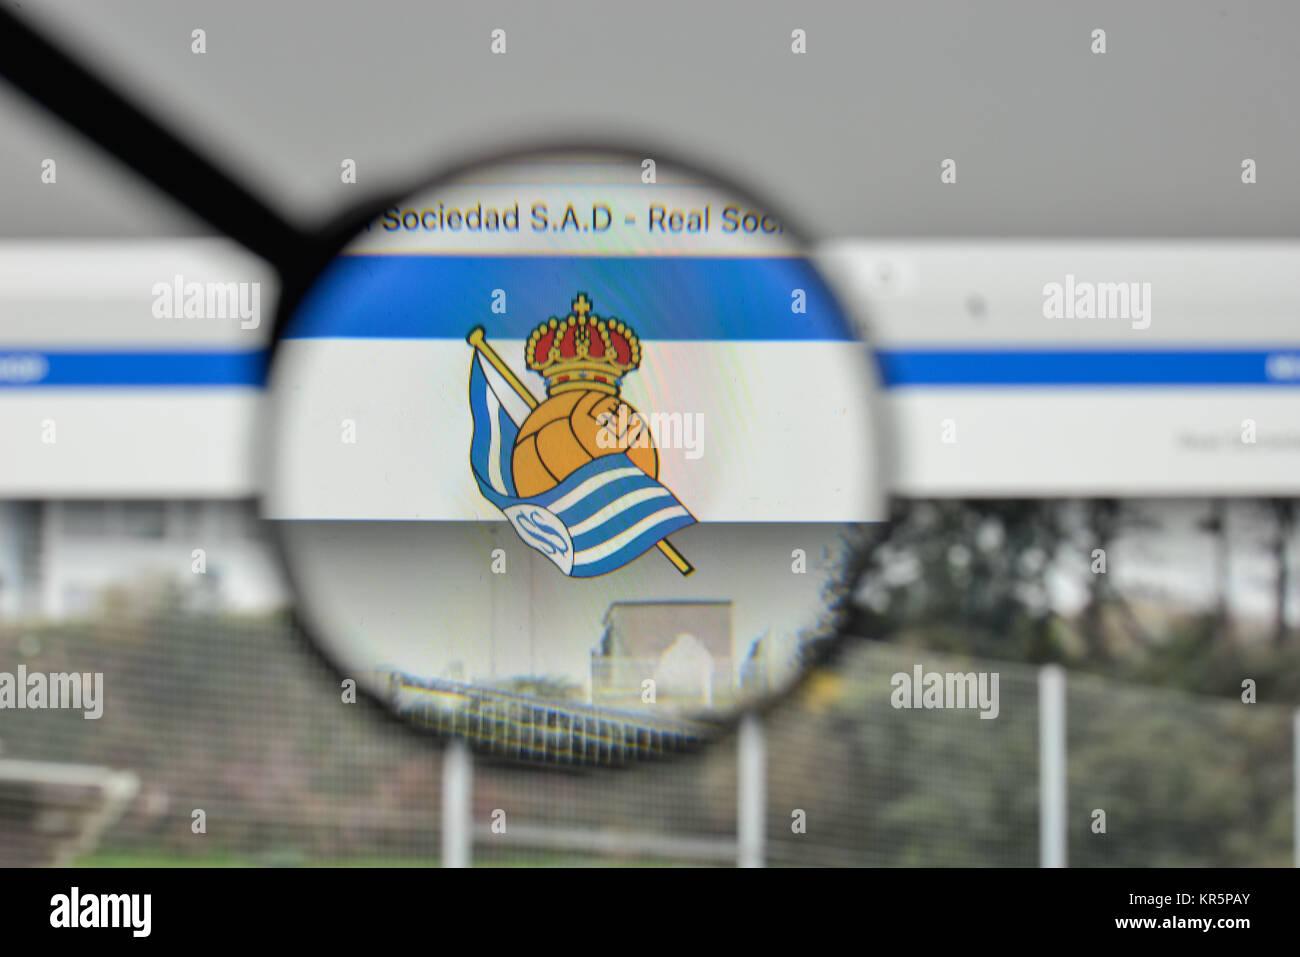 Milan, Italy - November 1, 2017: Real Sociedad logo on the website homepage. - Stock Image